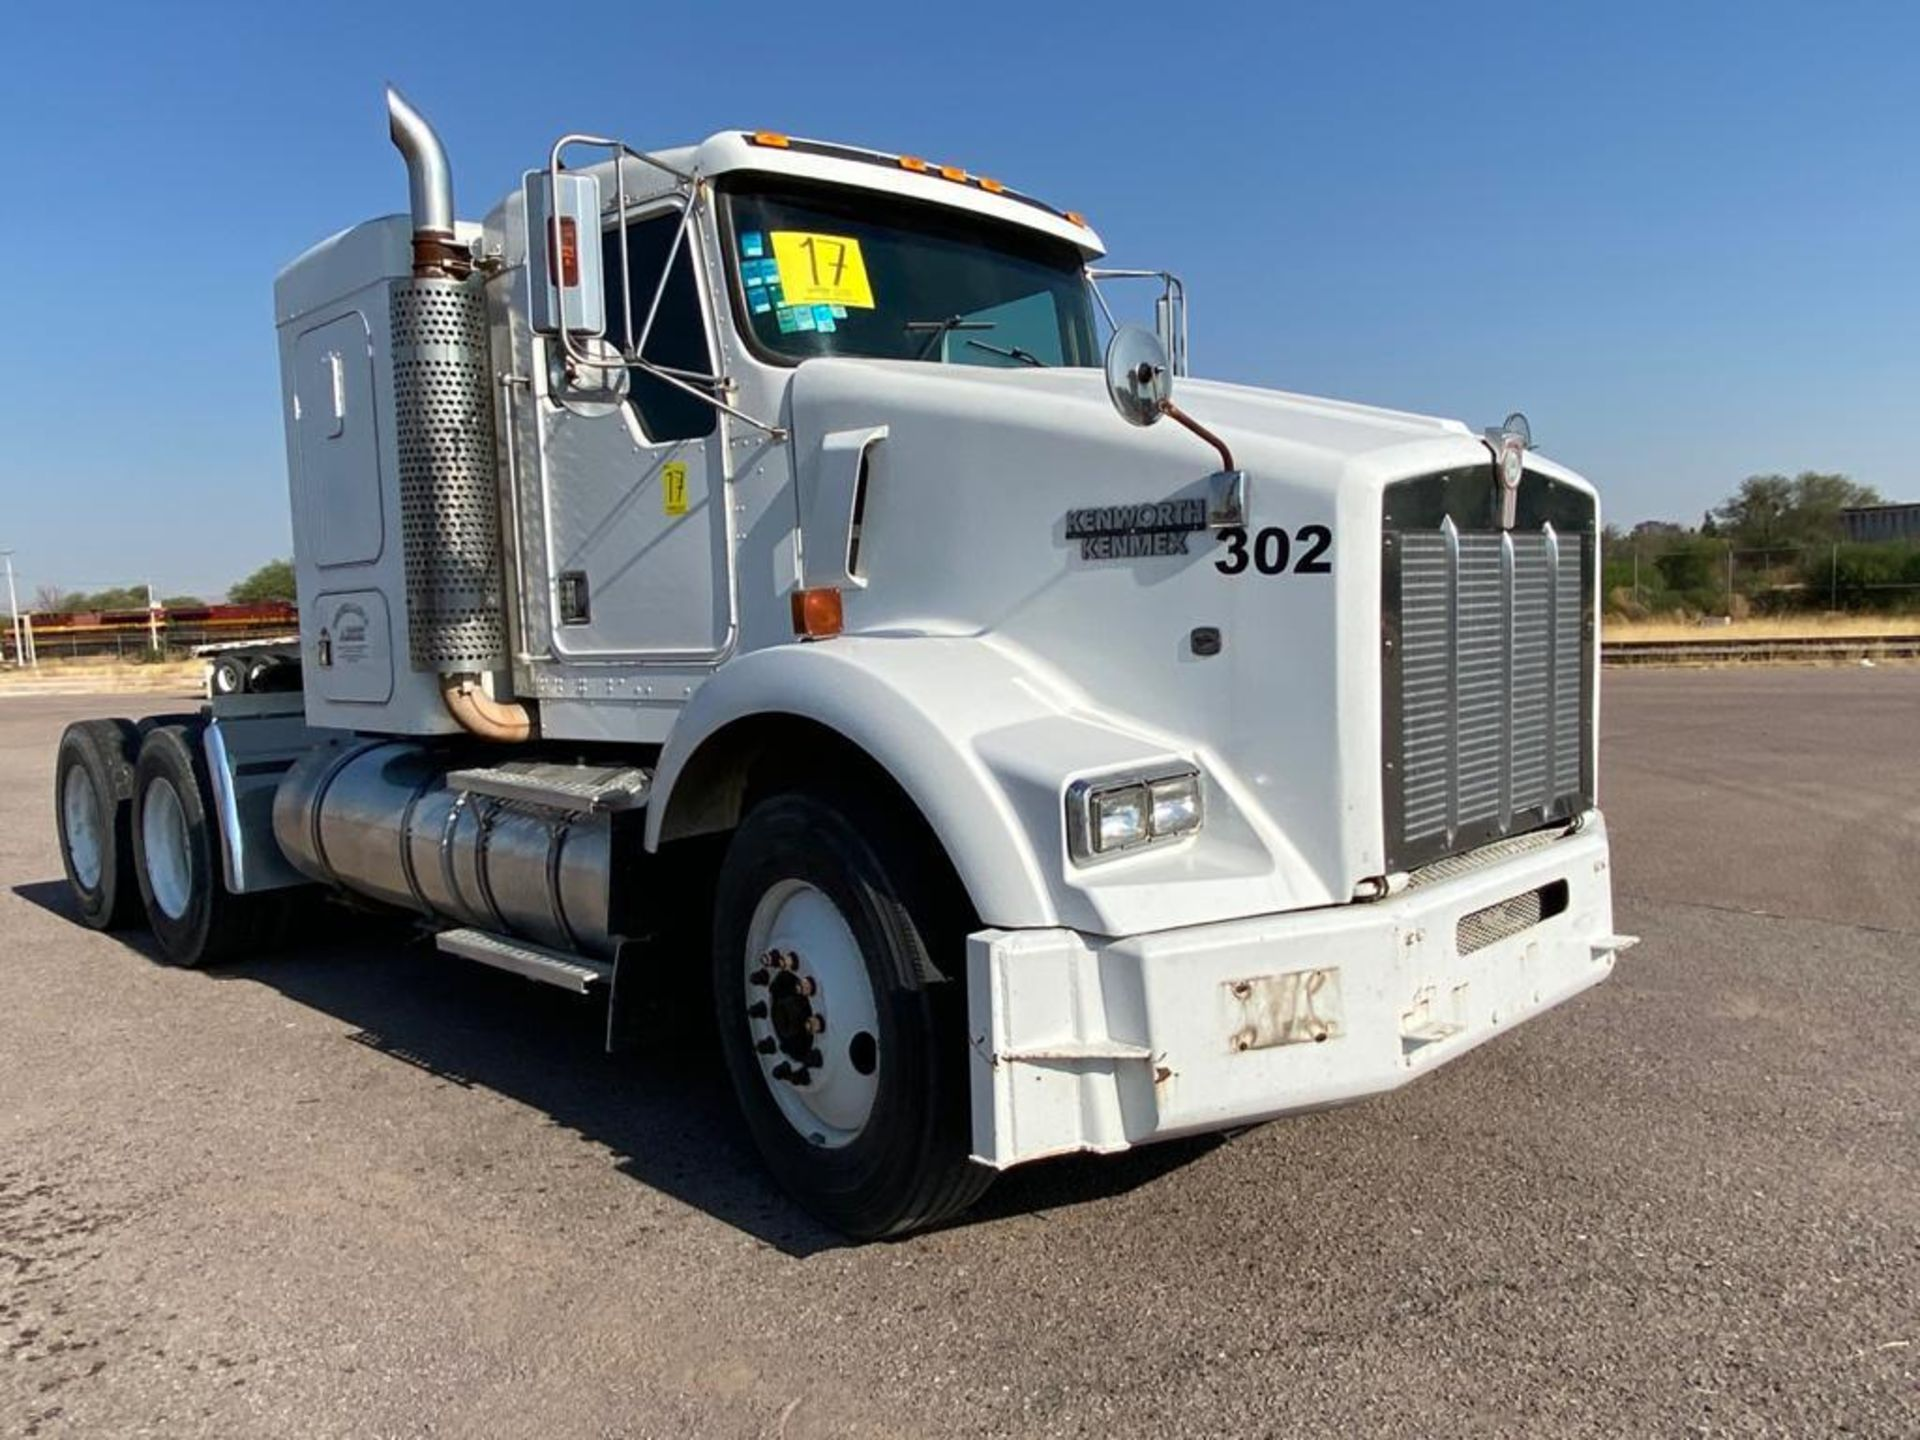 1998 Kenworth Sleeper Truck Tractor, standard transmission of 18 speeds - Image 3 of 55